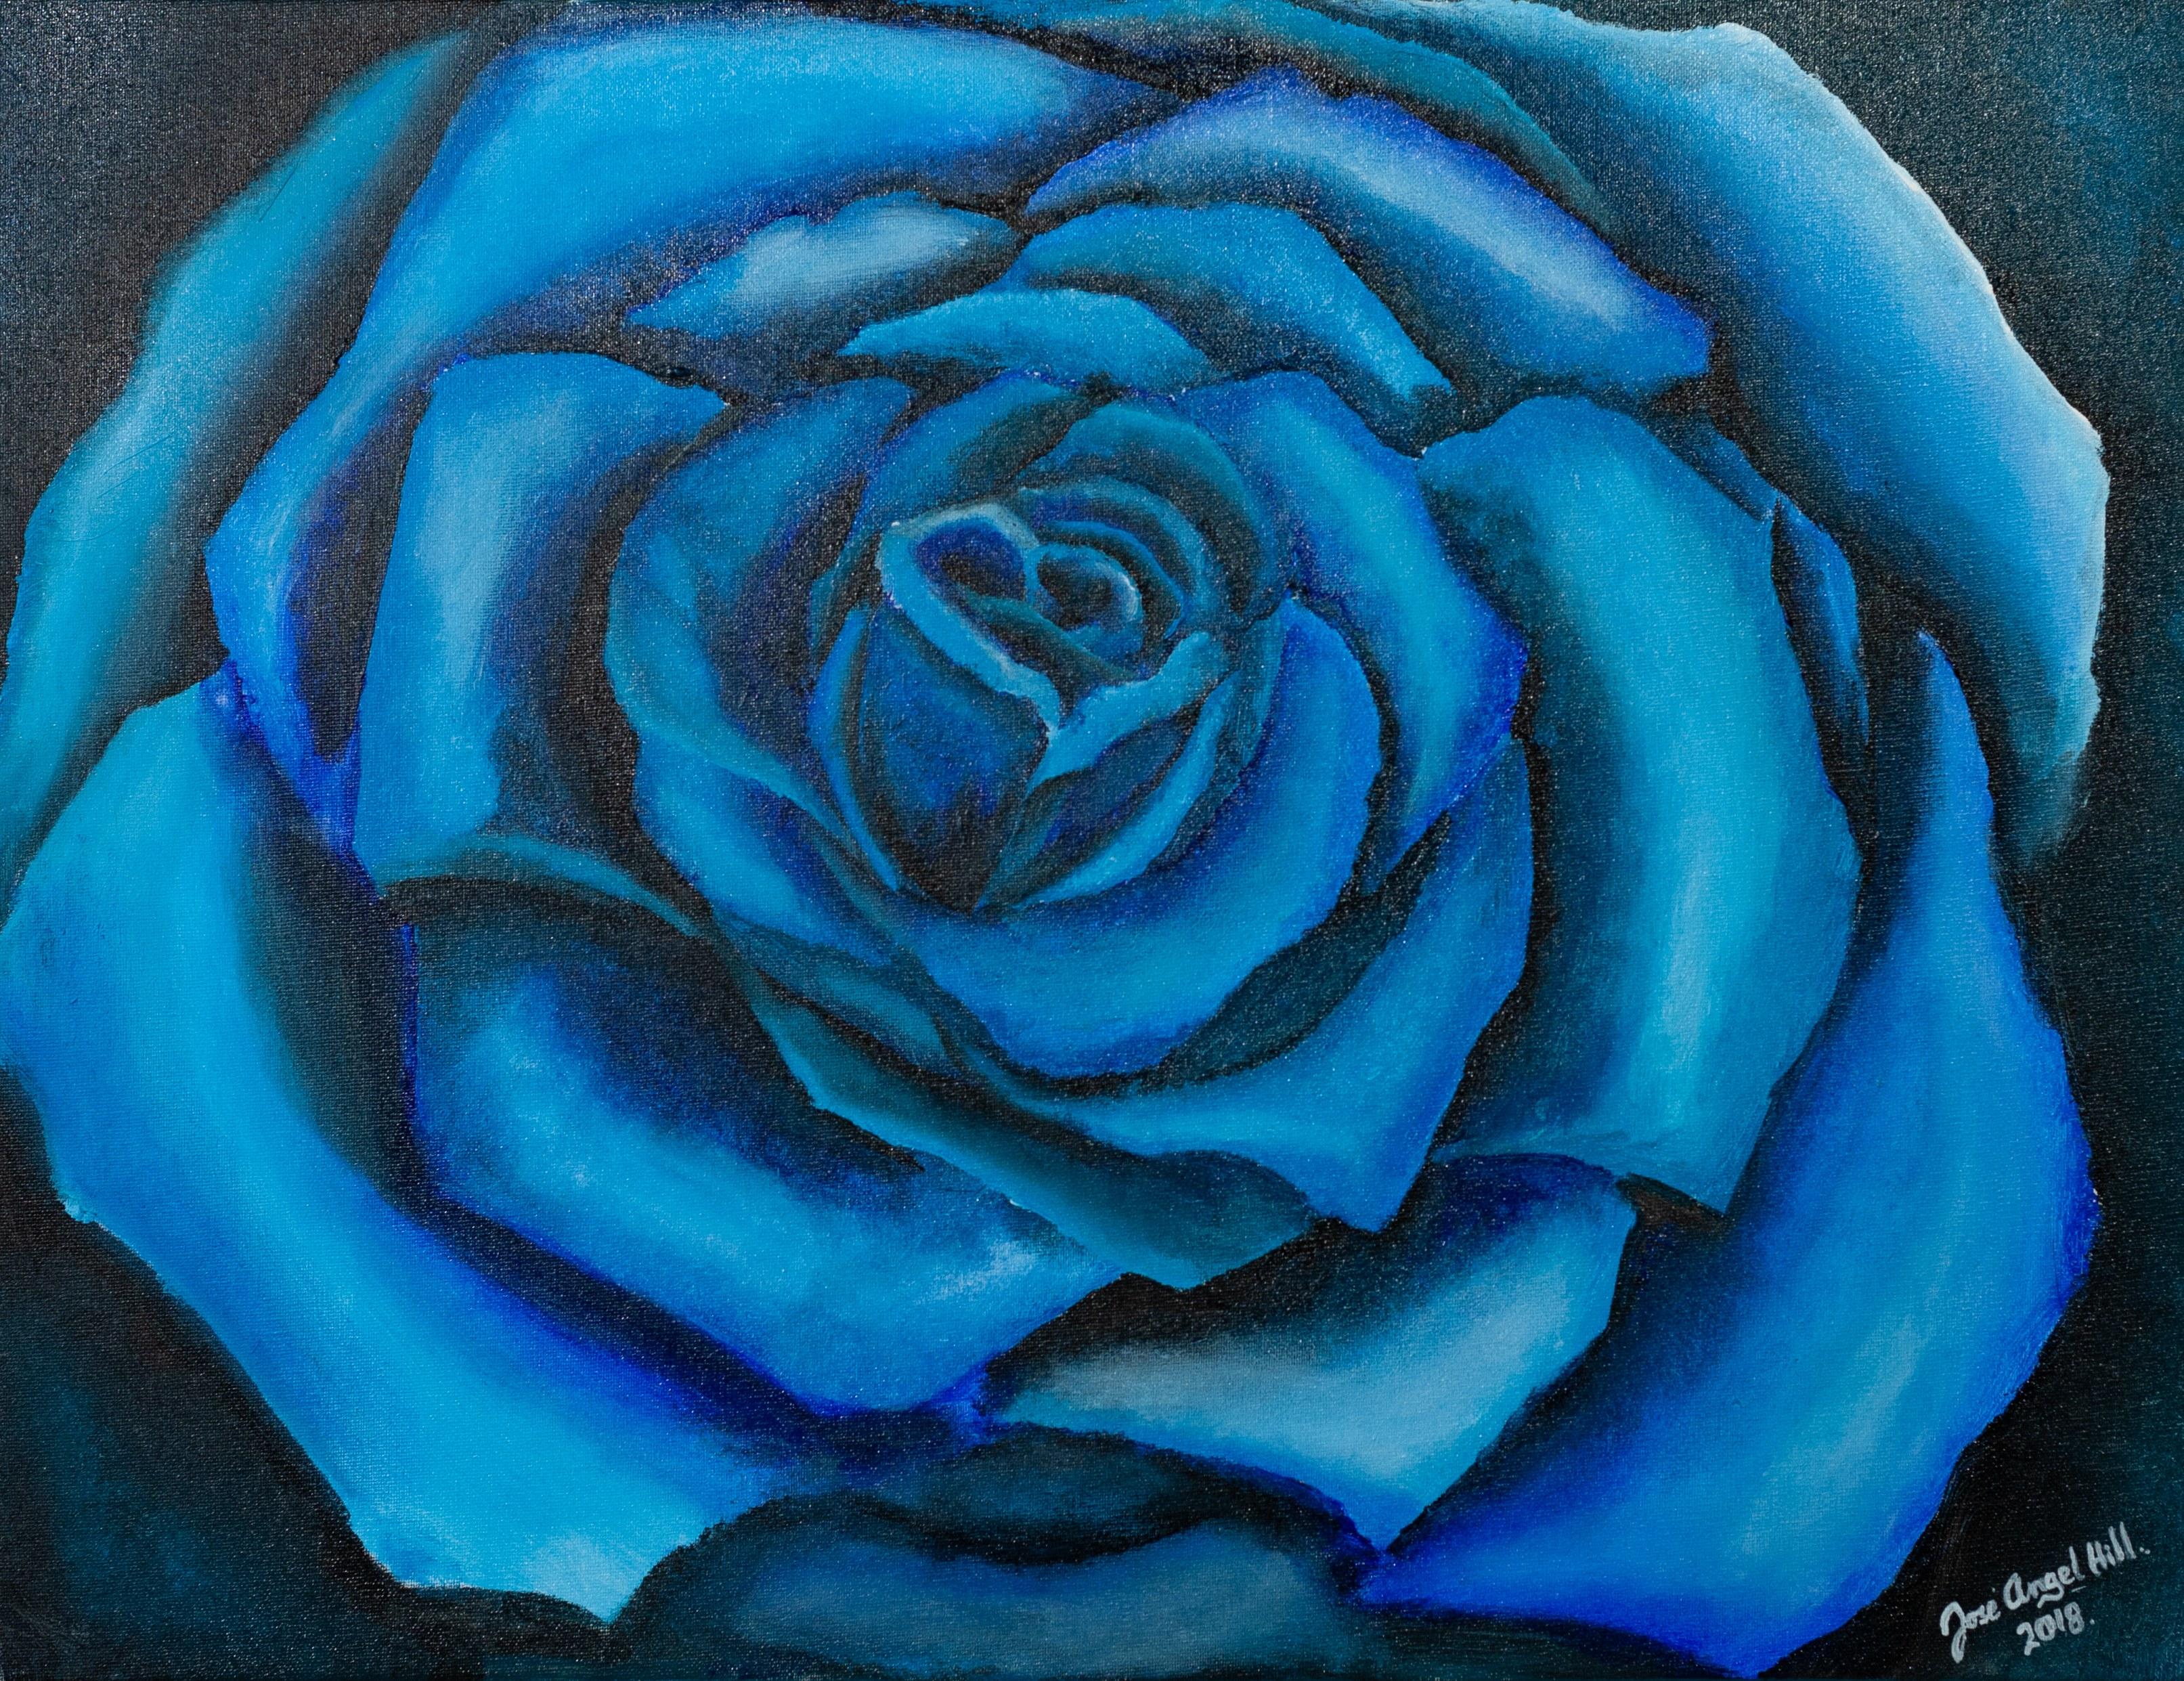 José Angel Hill, Blue rose